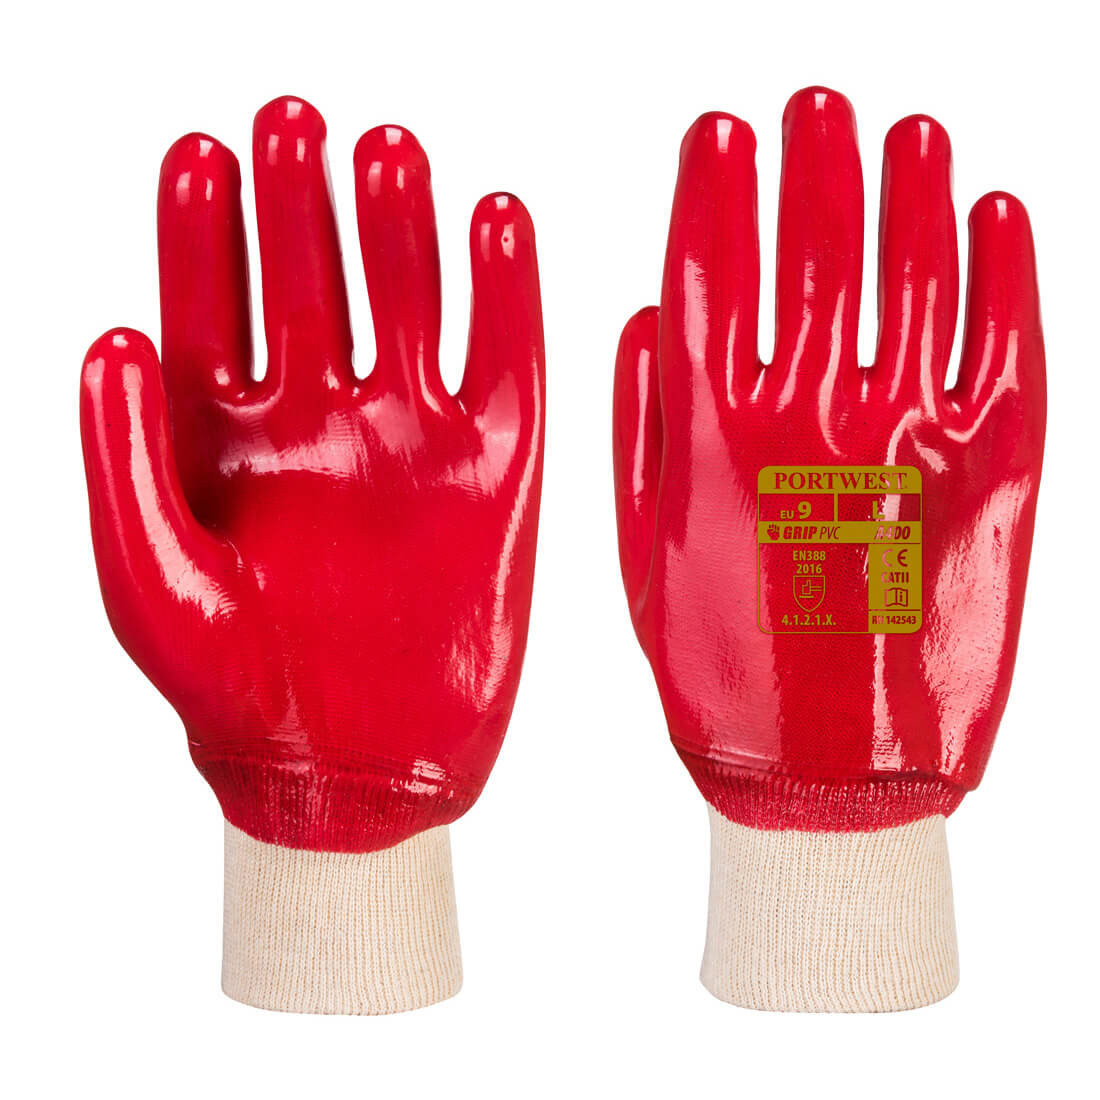 Manusa PVC Knitwrist - Echipamente de protectie personala